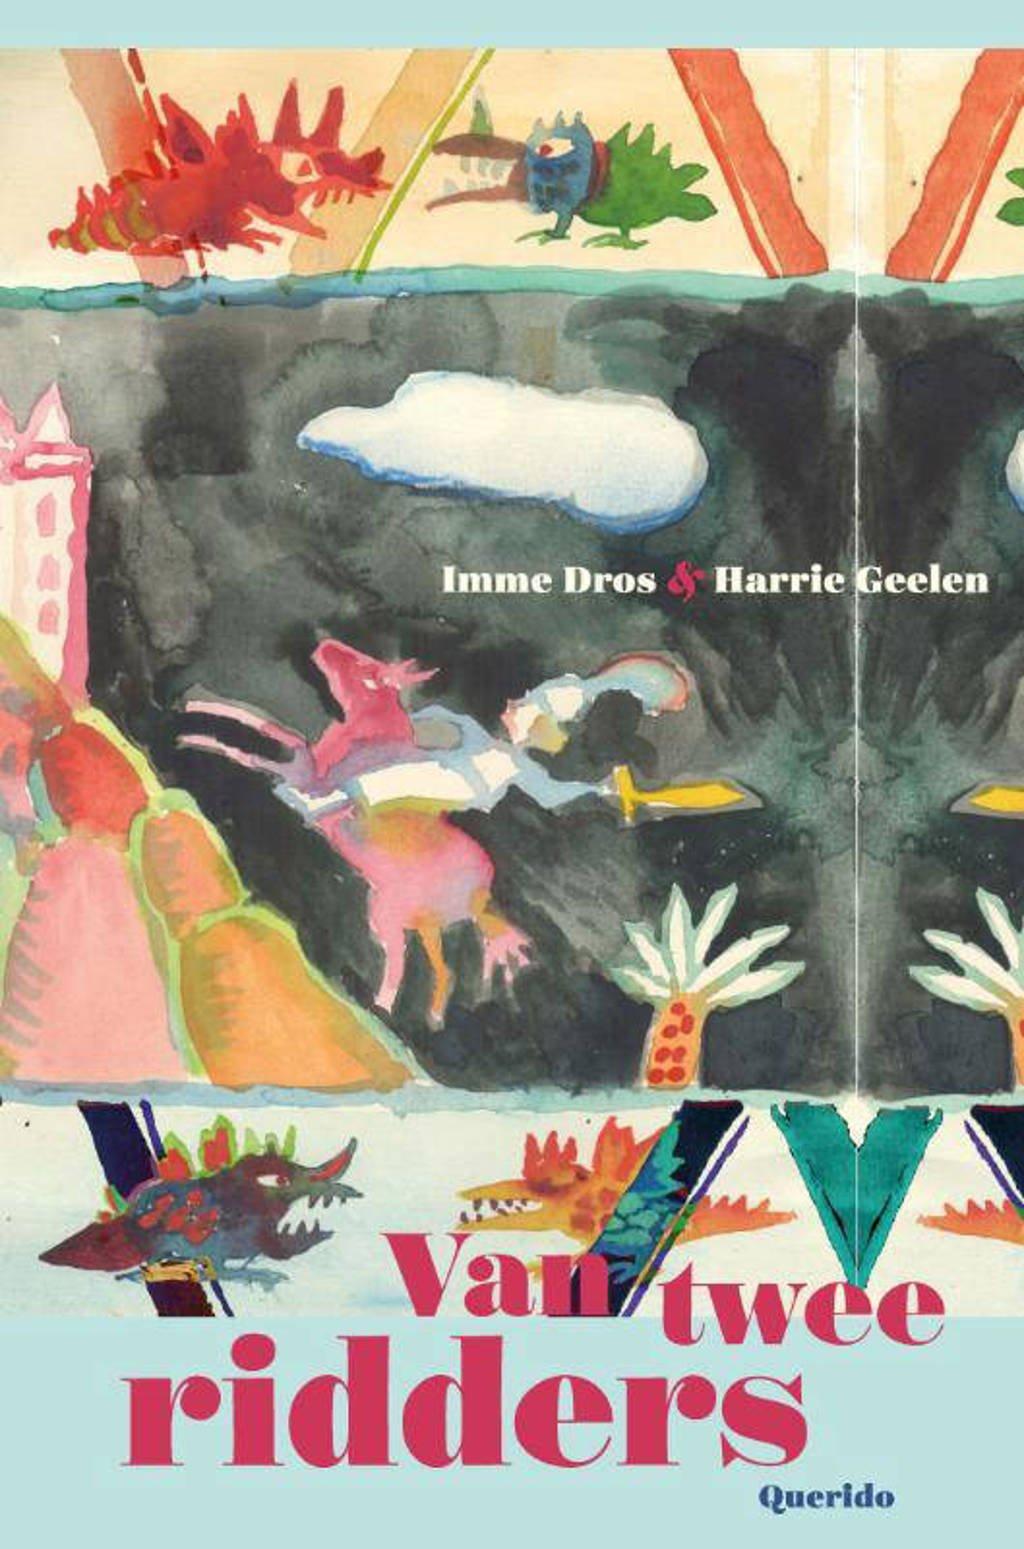 Van twee ridders - Imme Dros en Harry Geelen